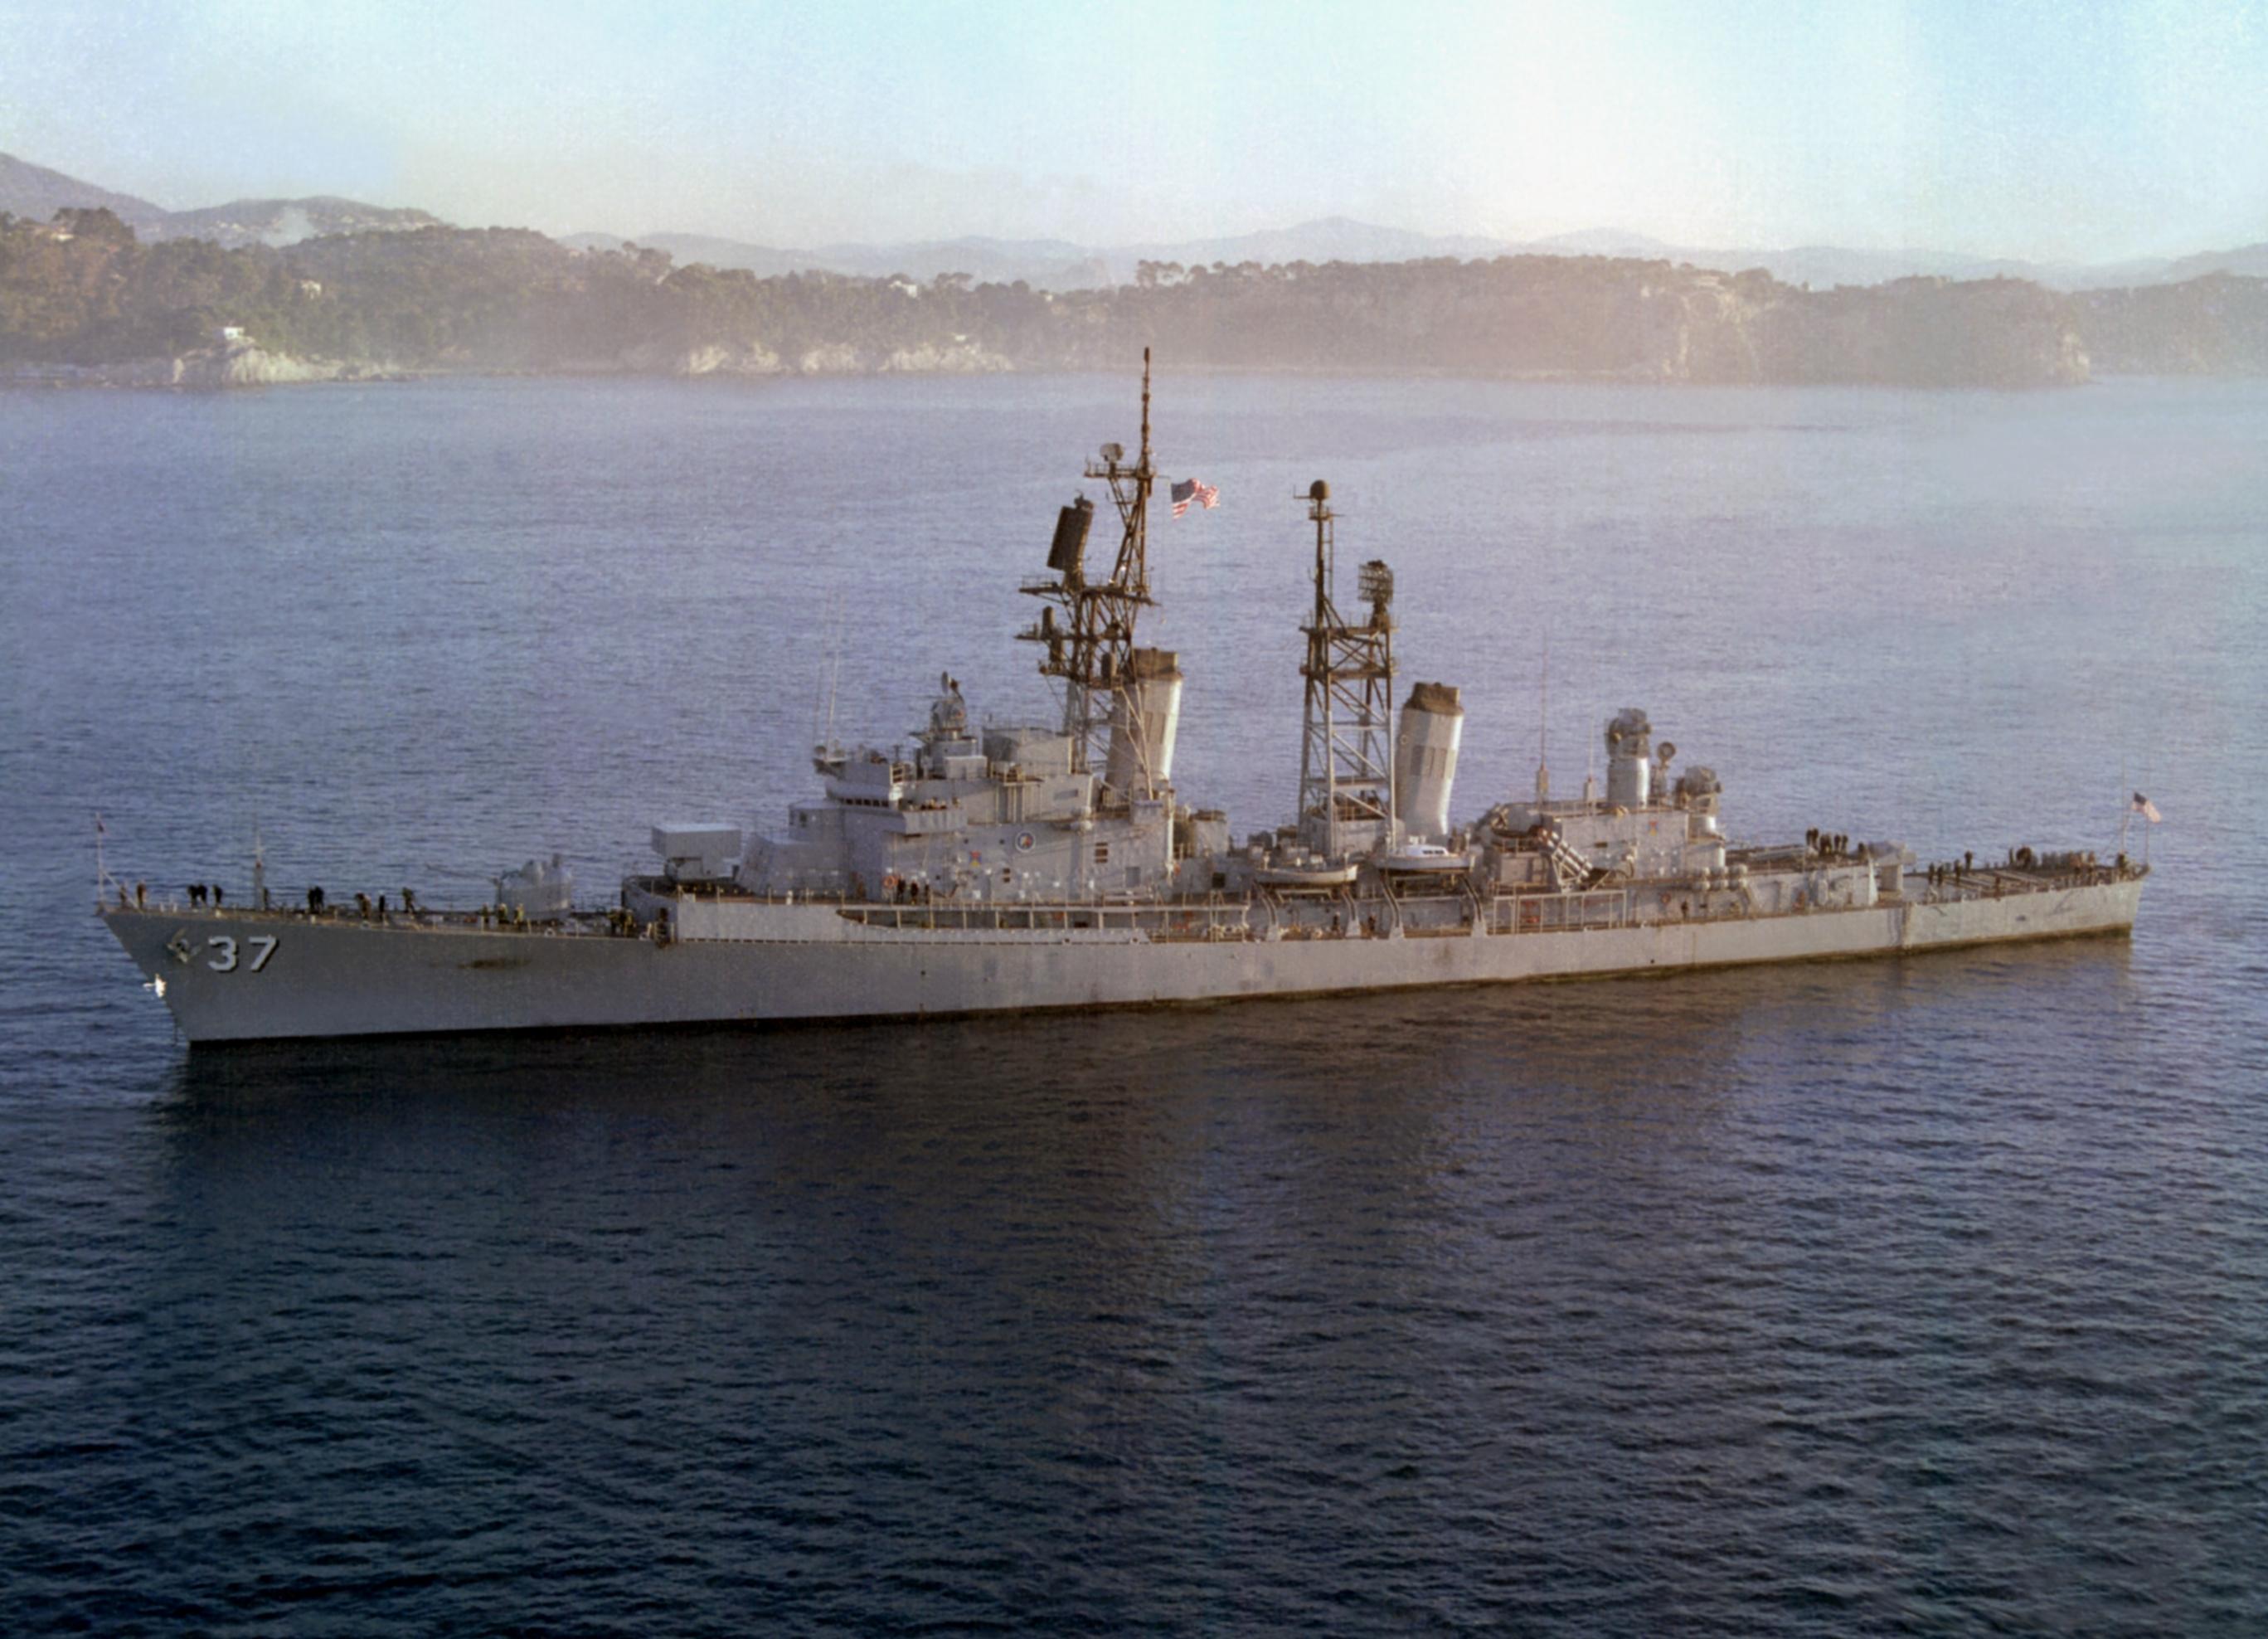 The U.S. Navy guided missile destroyer USS Farragut (DDG